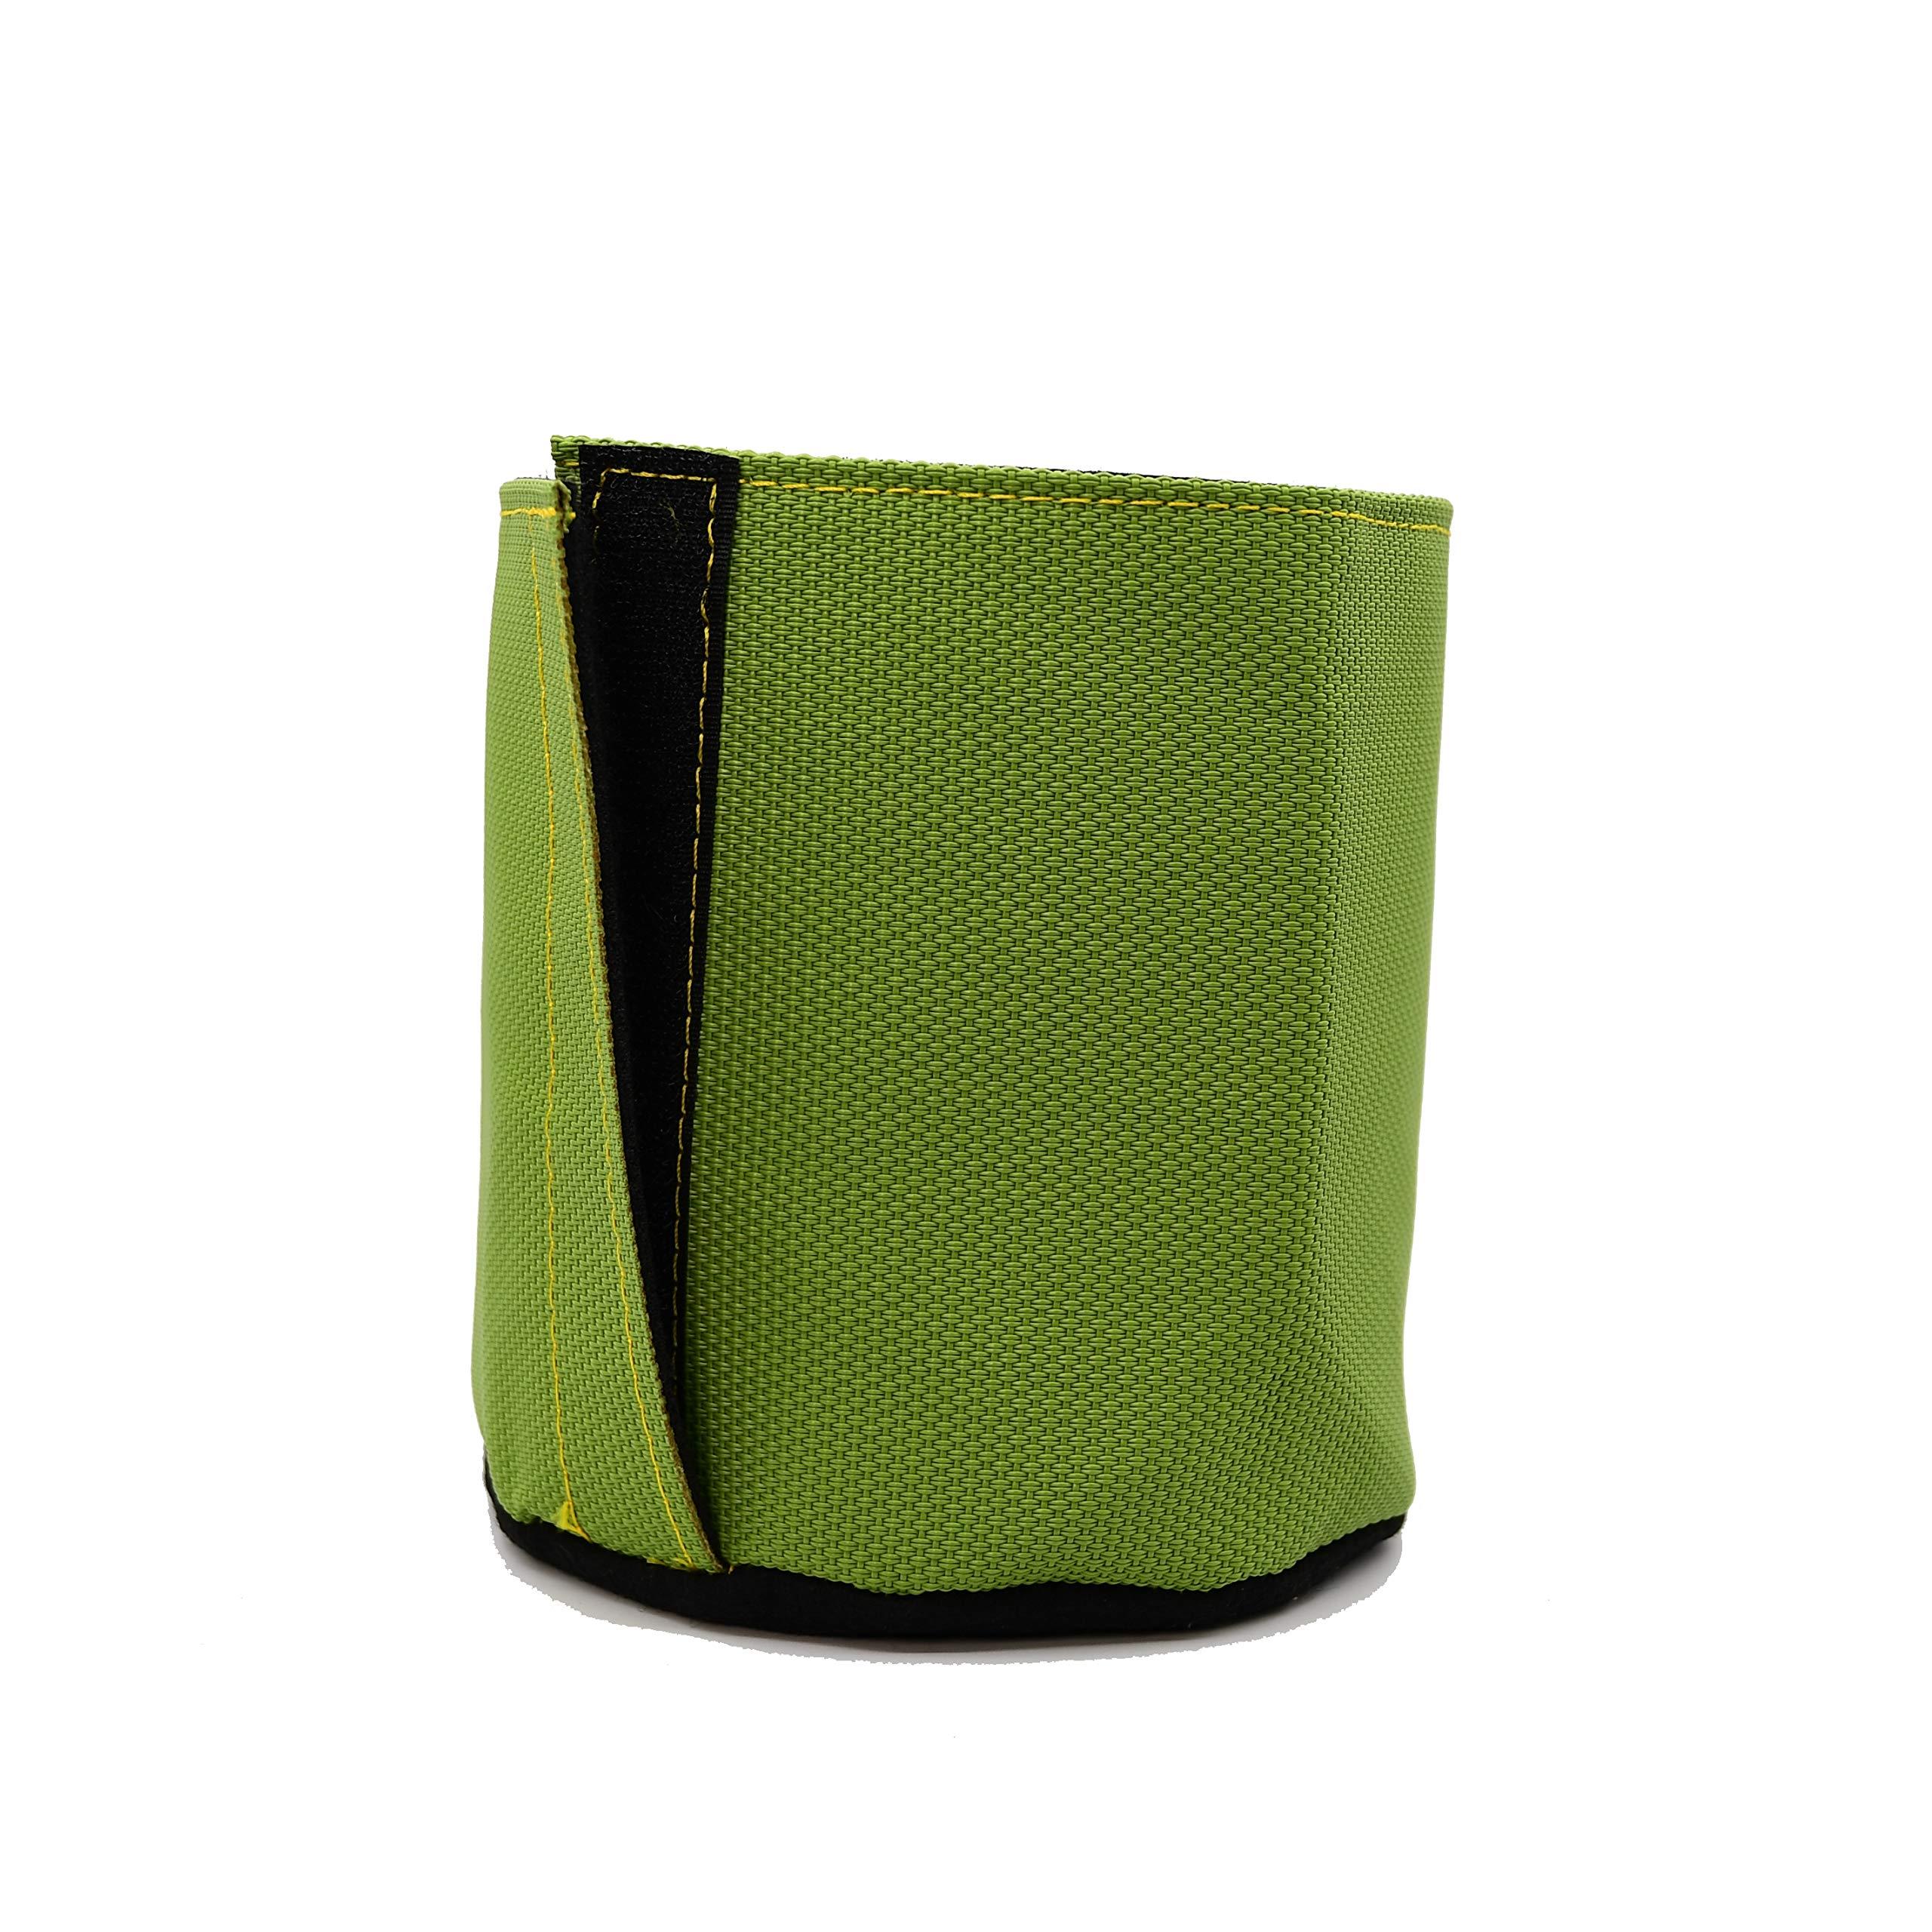 Honor Pro Series Indoor/Outdoor Velcro Seedling Bags, Pack of 3 Bags